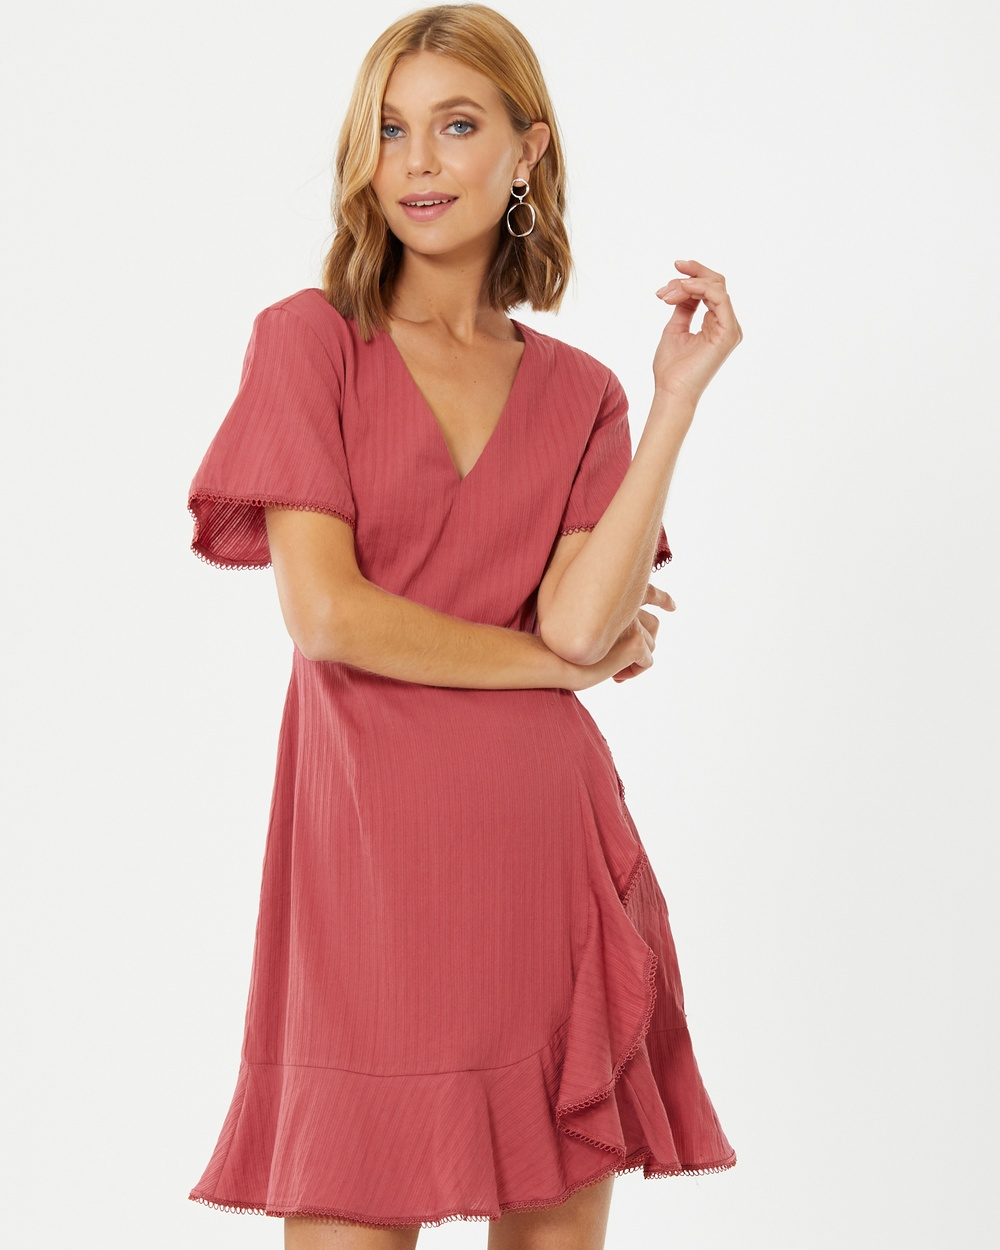 Calli Britta Dress Dresses Berry Red Britta Dress